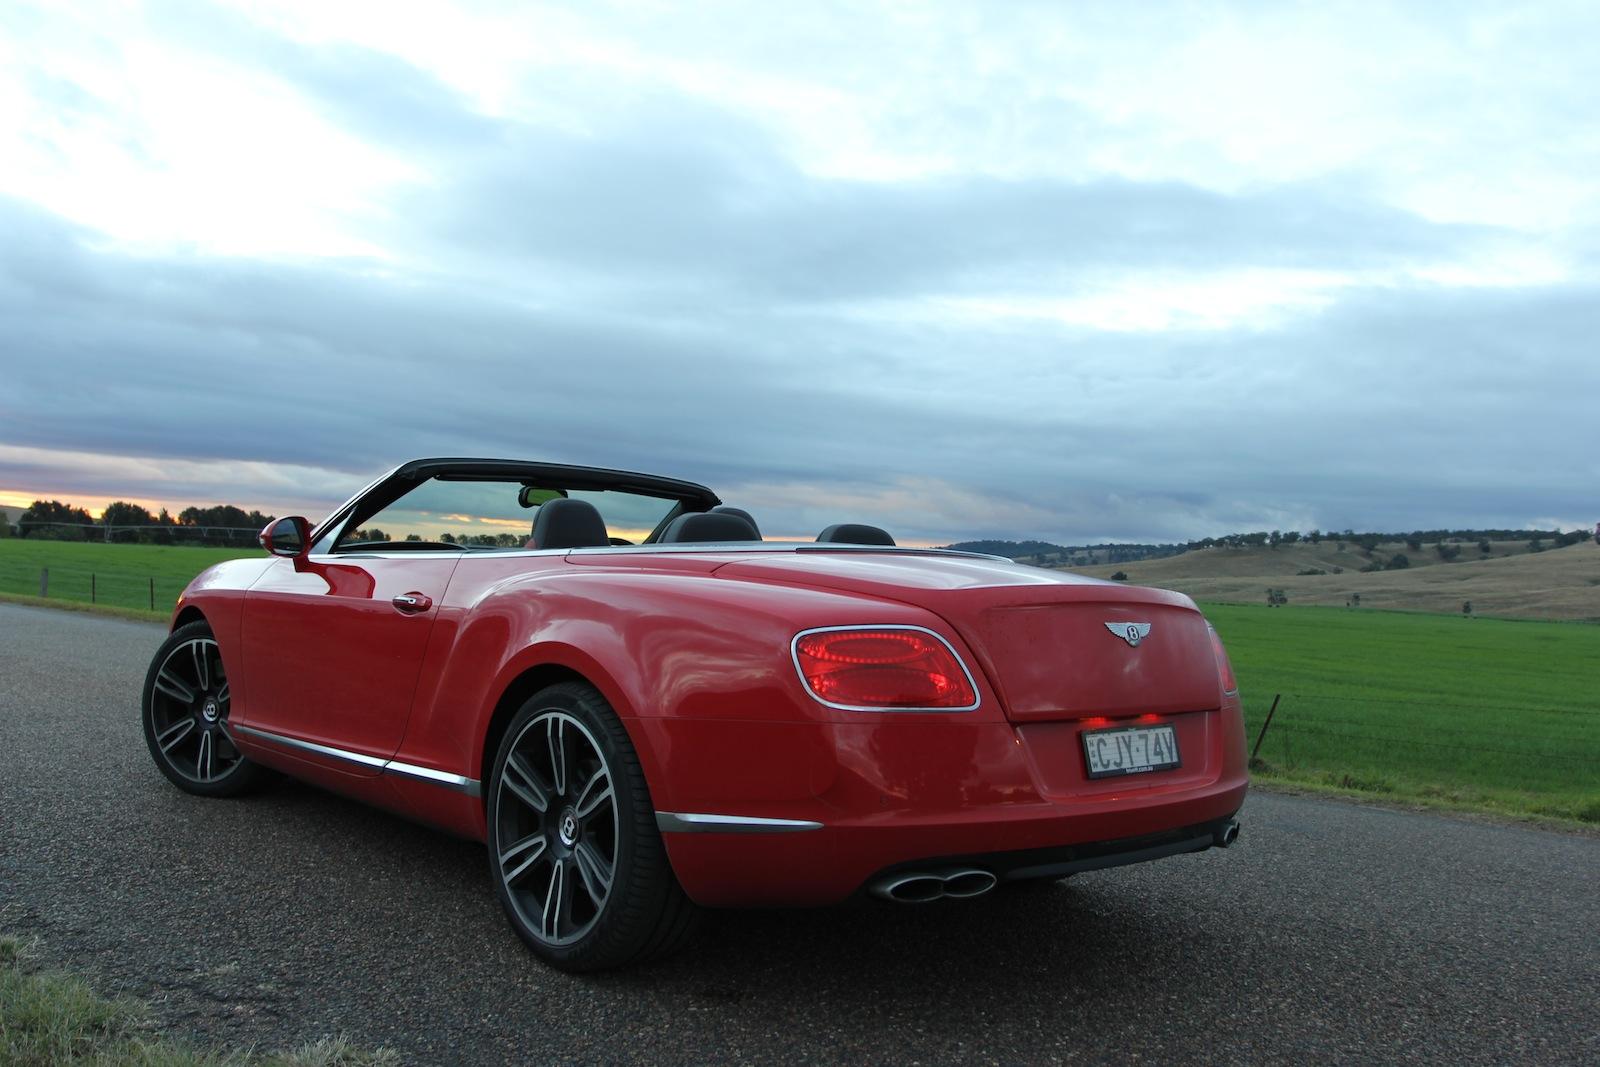 2013 Bentley Continental Gtc Review Caradvice